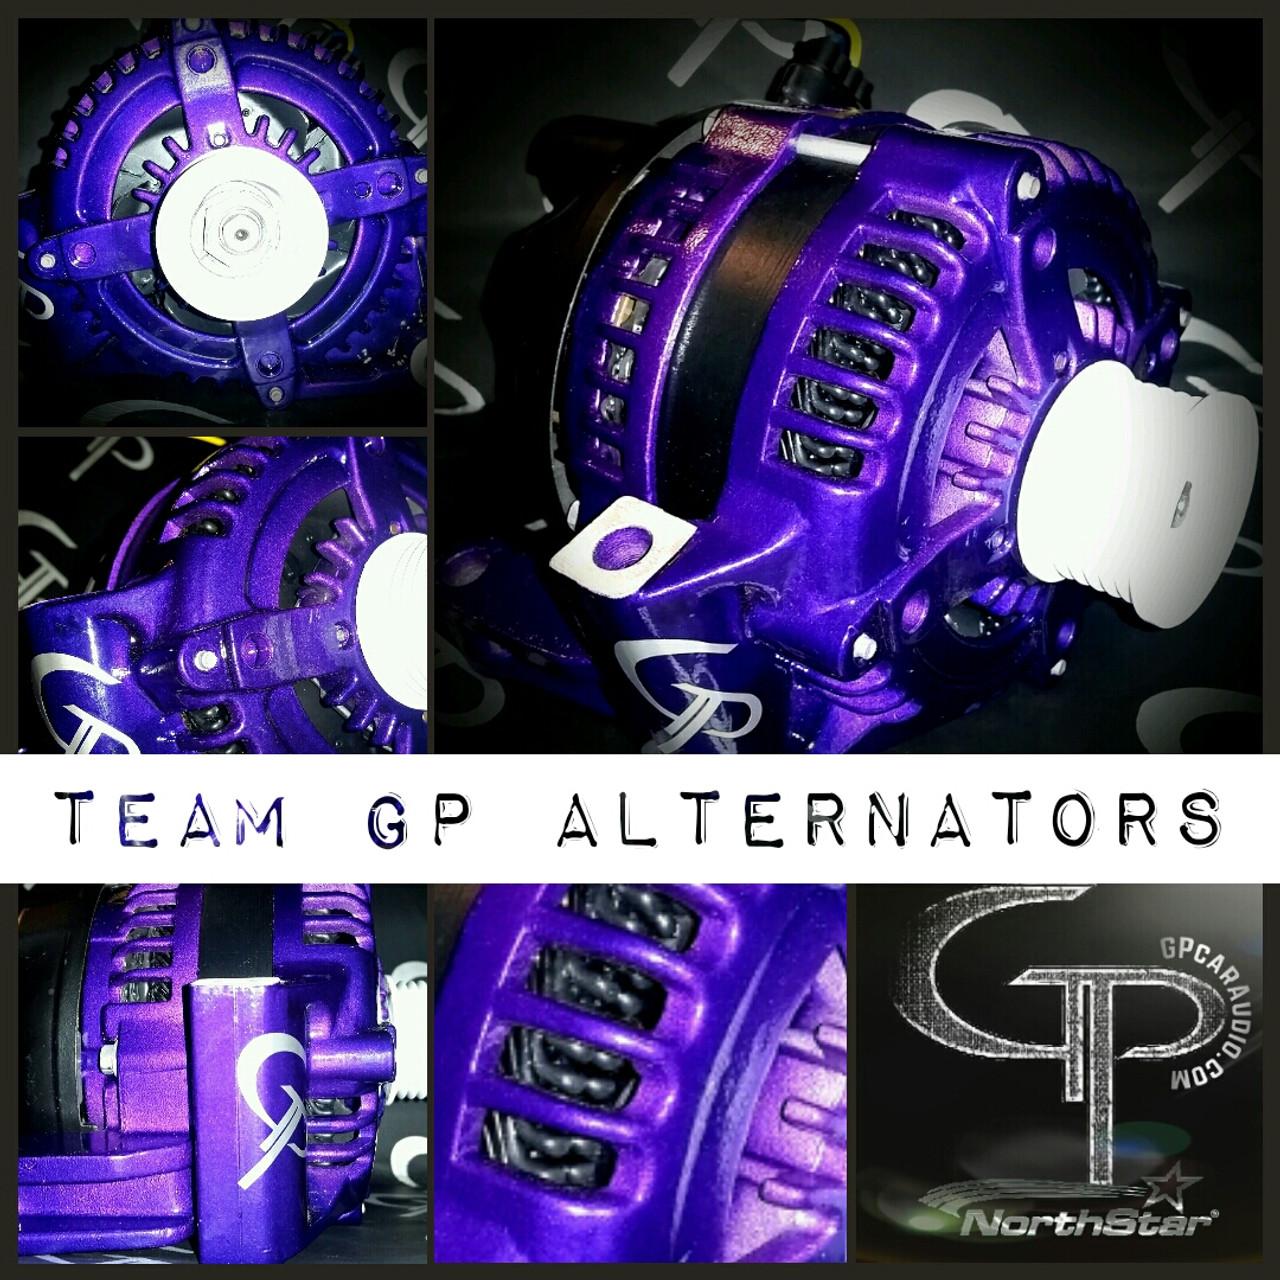 INFINITY QX56 V8 -2007- 220 AMP TEAM GP Alternator